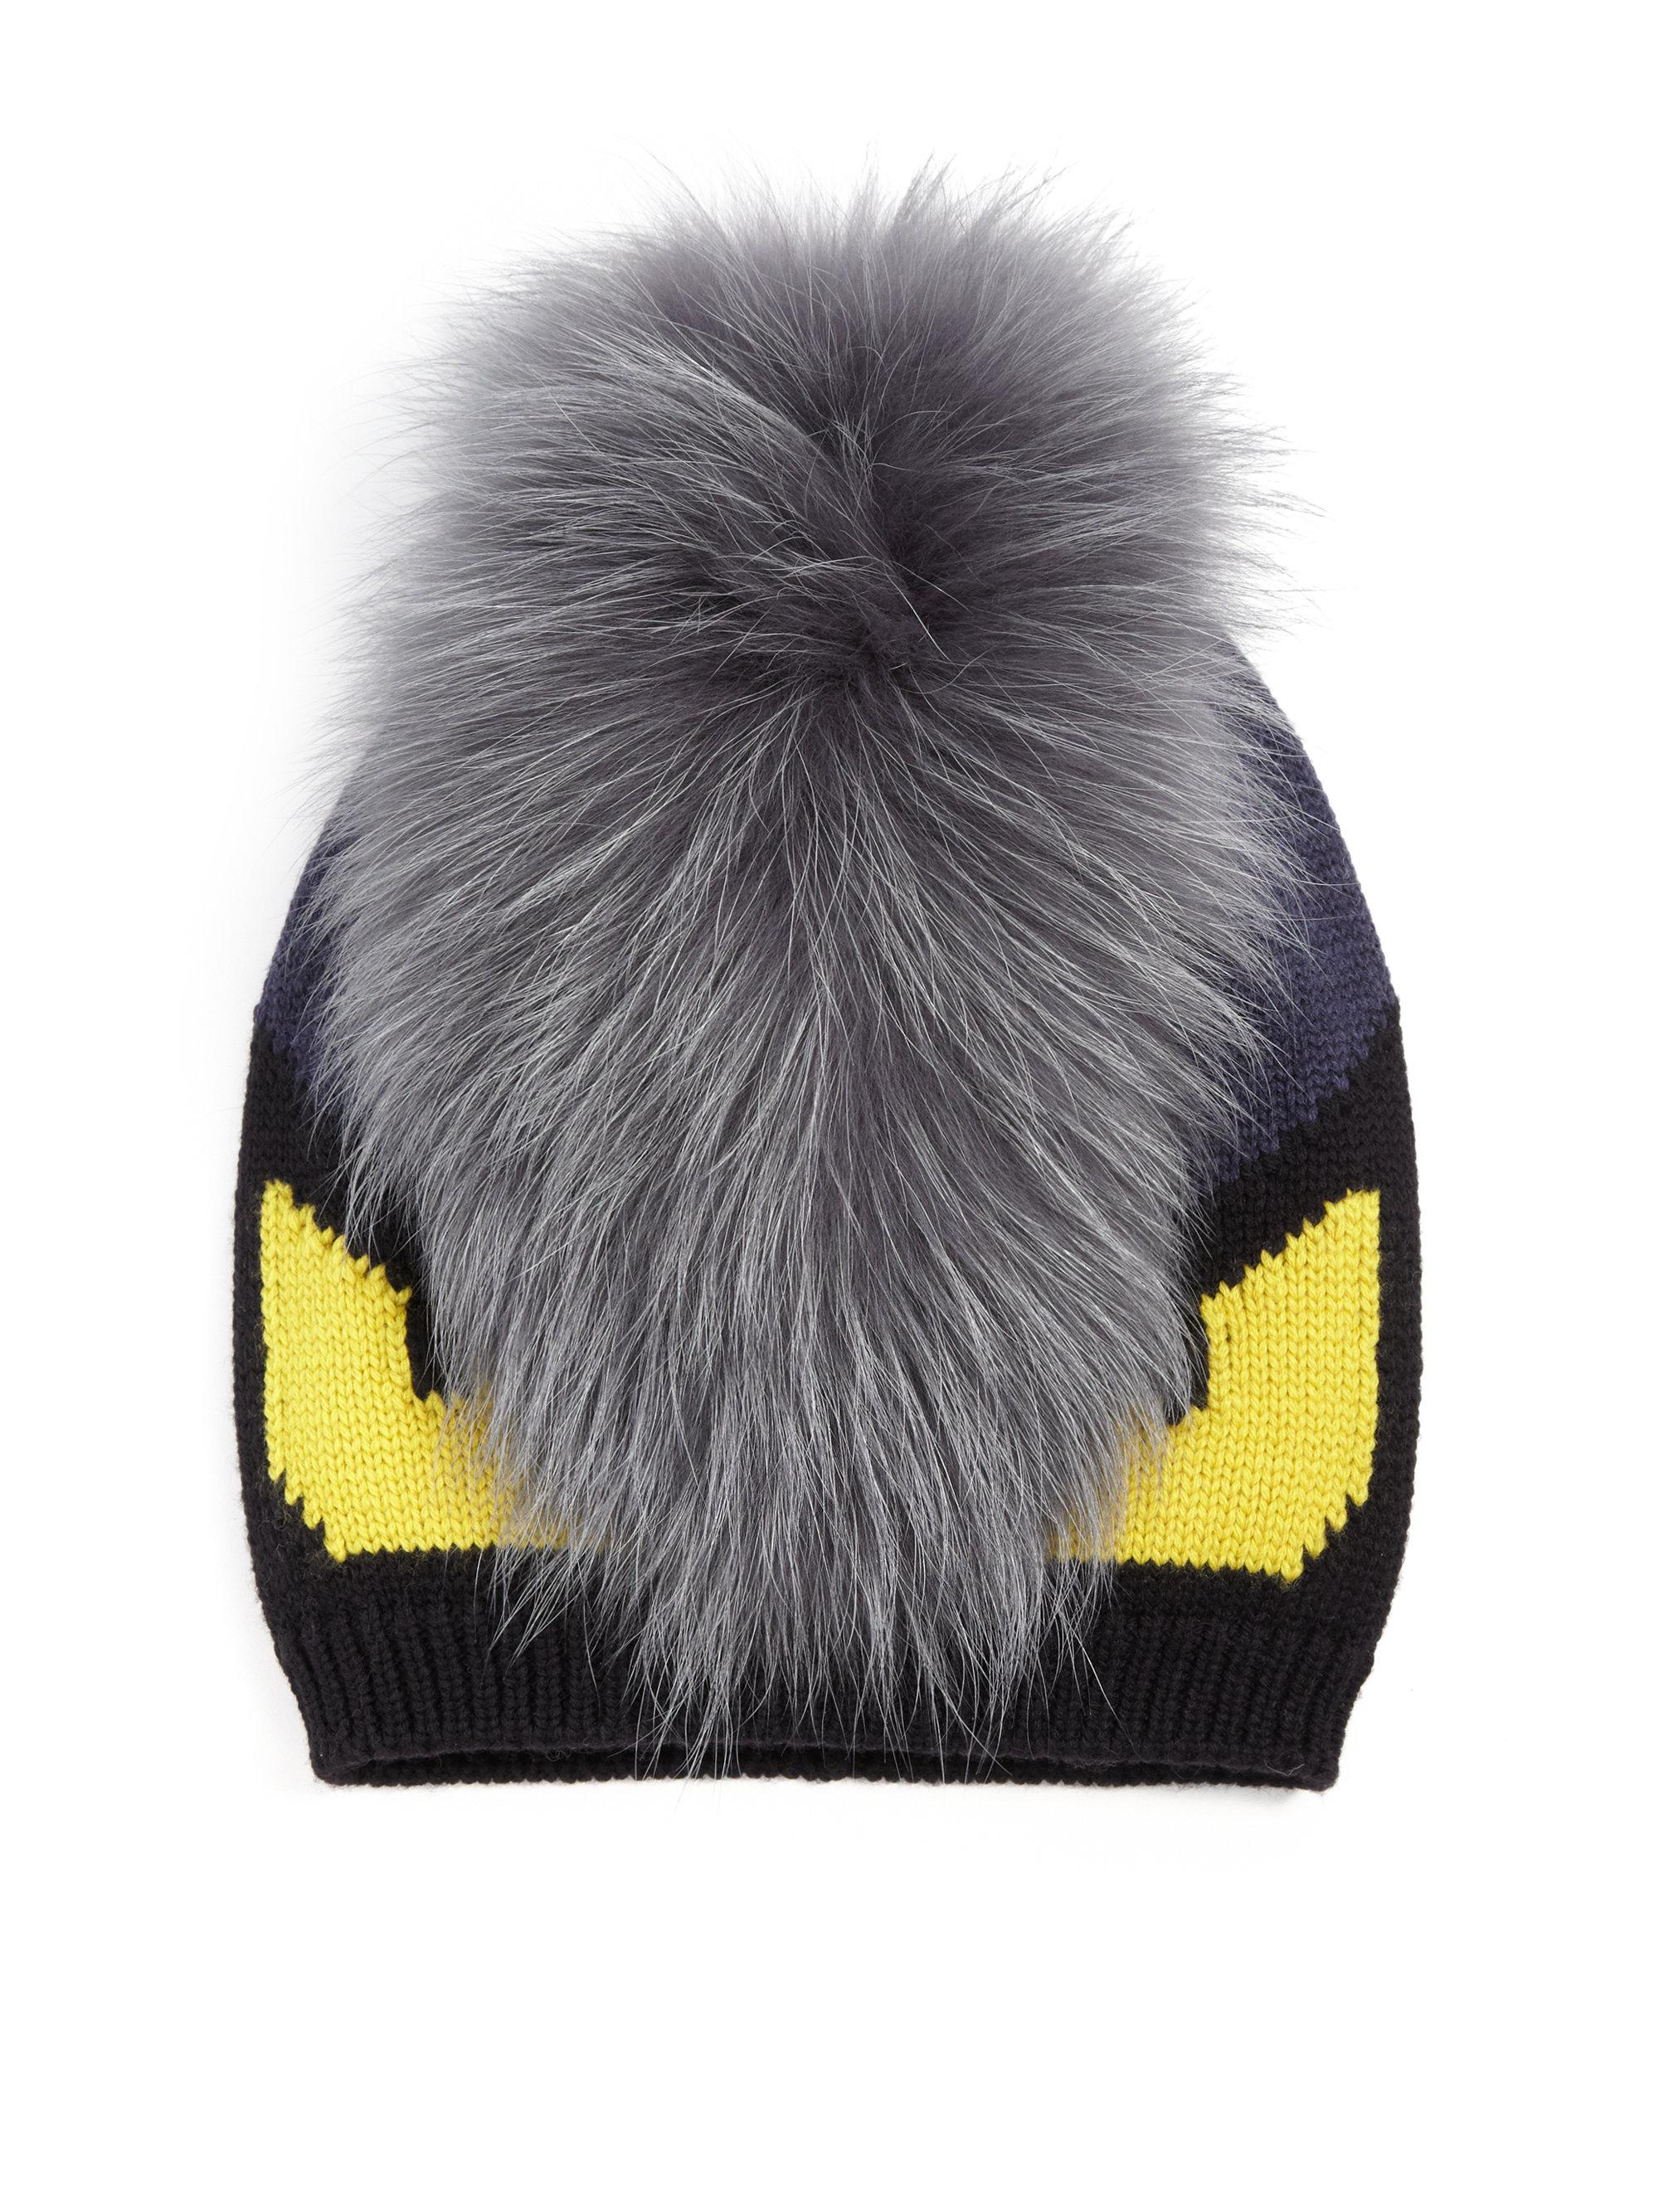 Lyst - Fendi Monster Fur-trimmed Wool Hat in Black for Men b00eed1ca7e